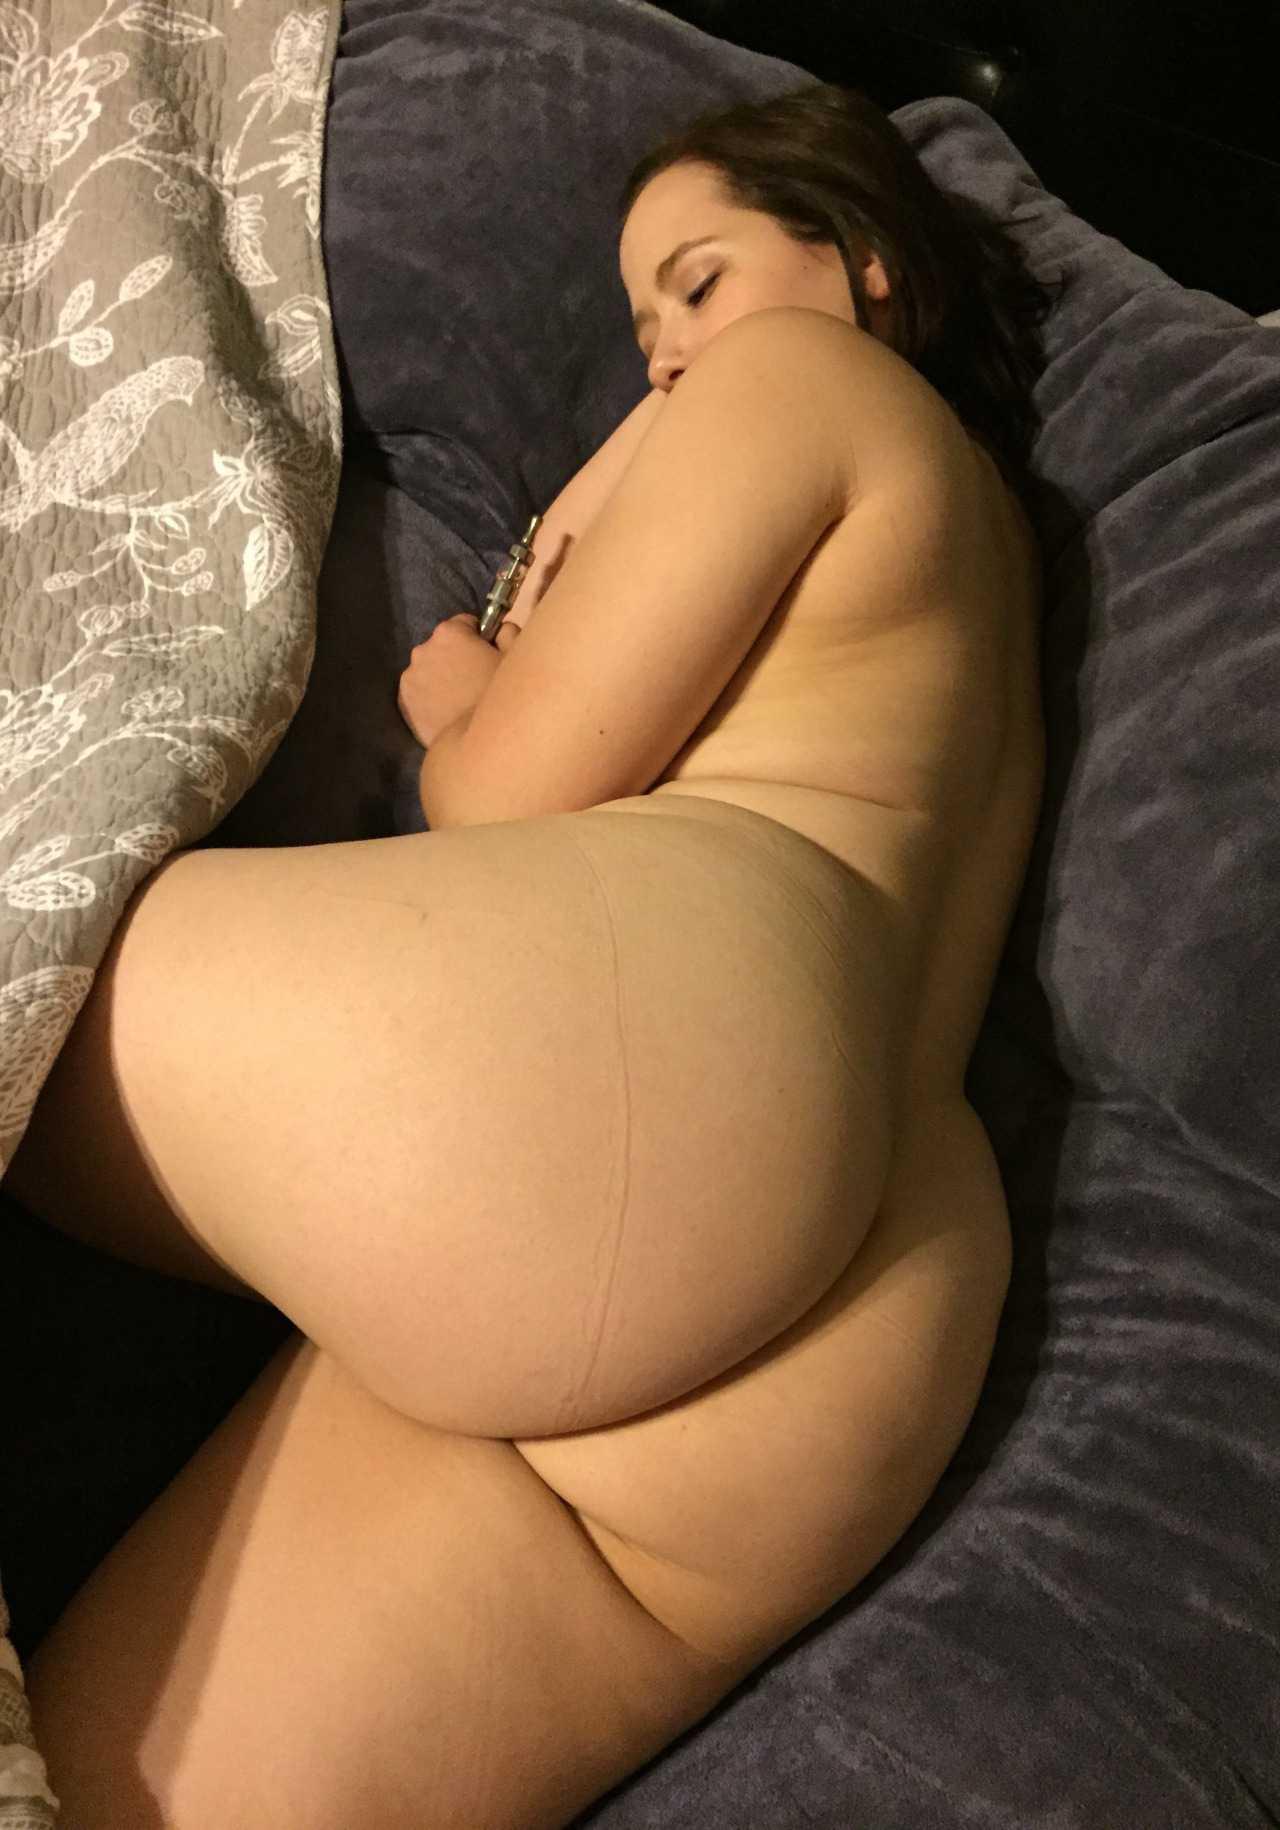 Las bellas nalgas de mi esposa - 2 4